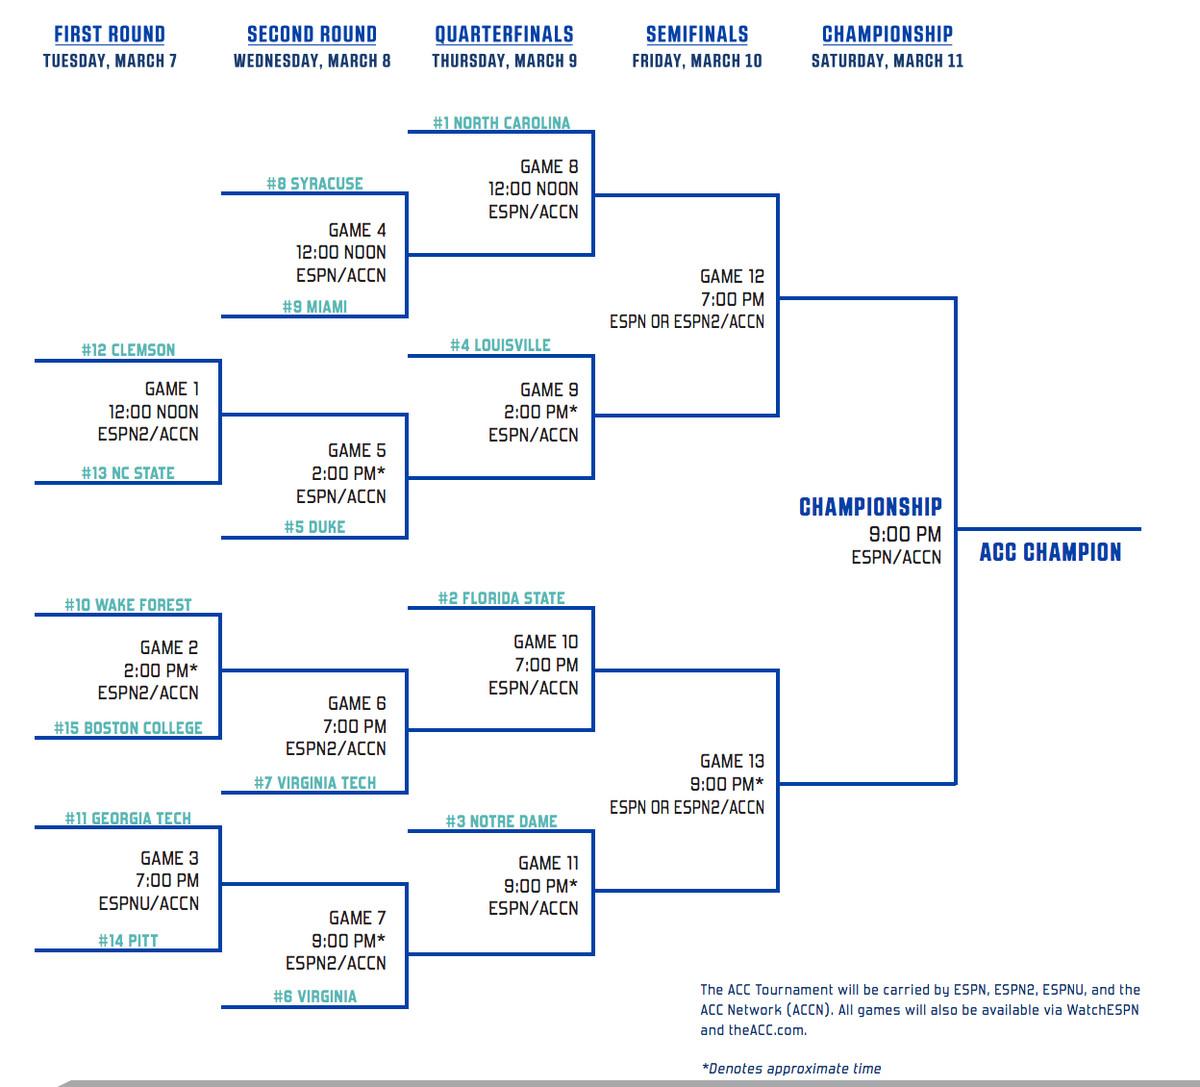 2017 ACC Tournament Bracket